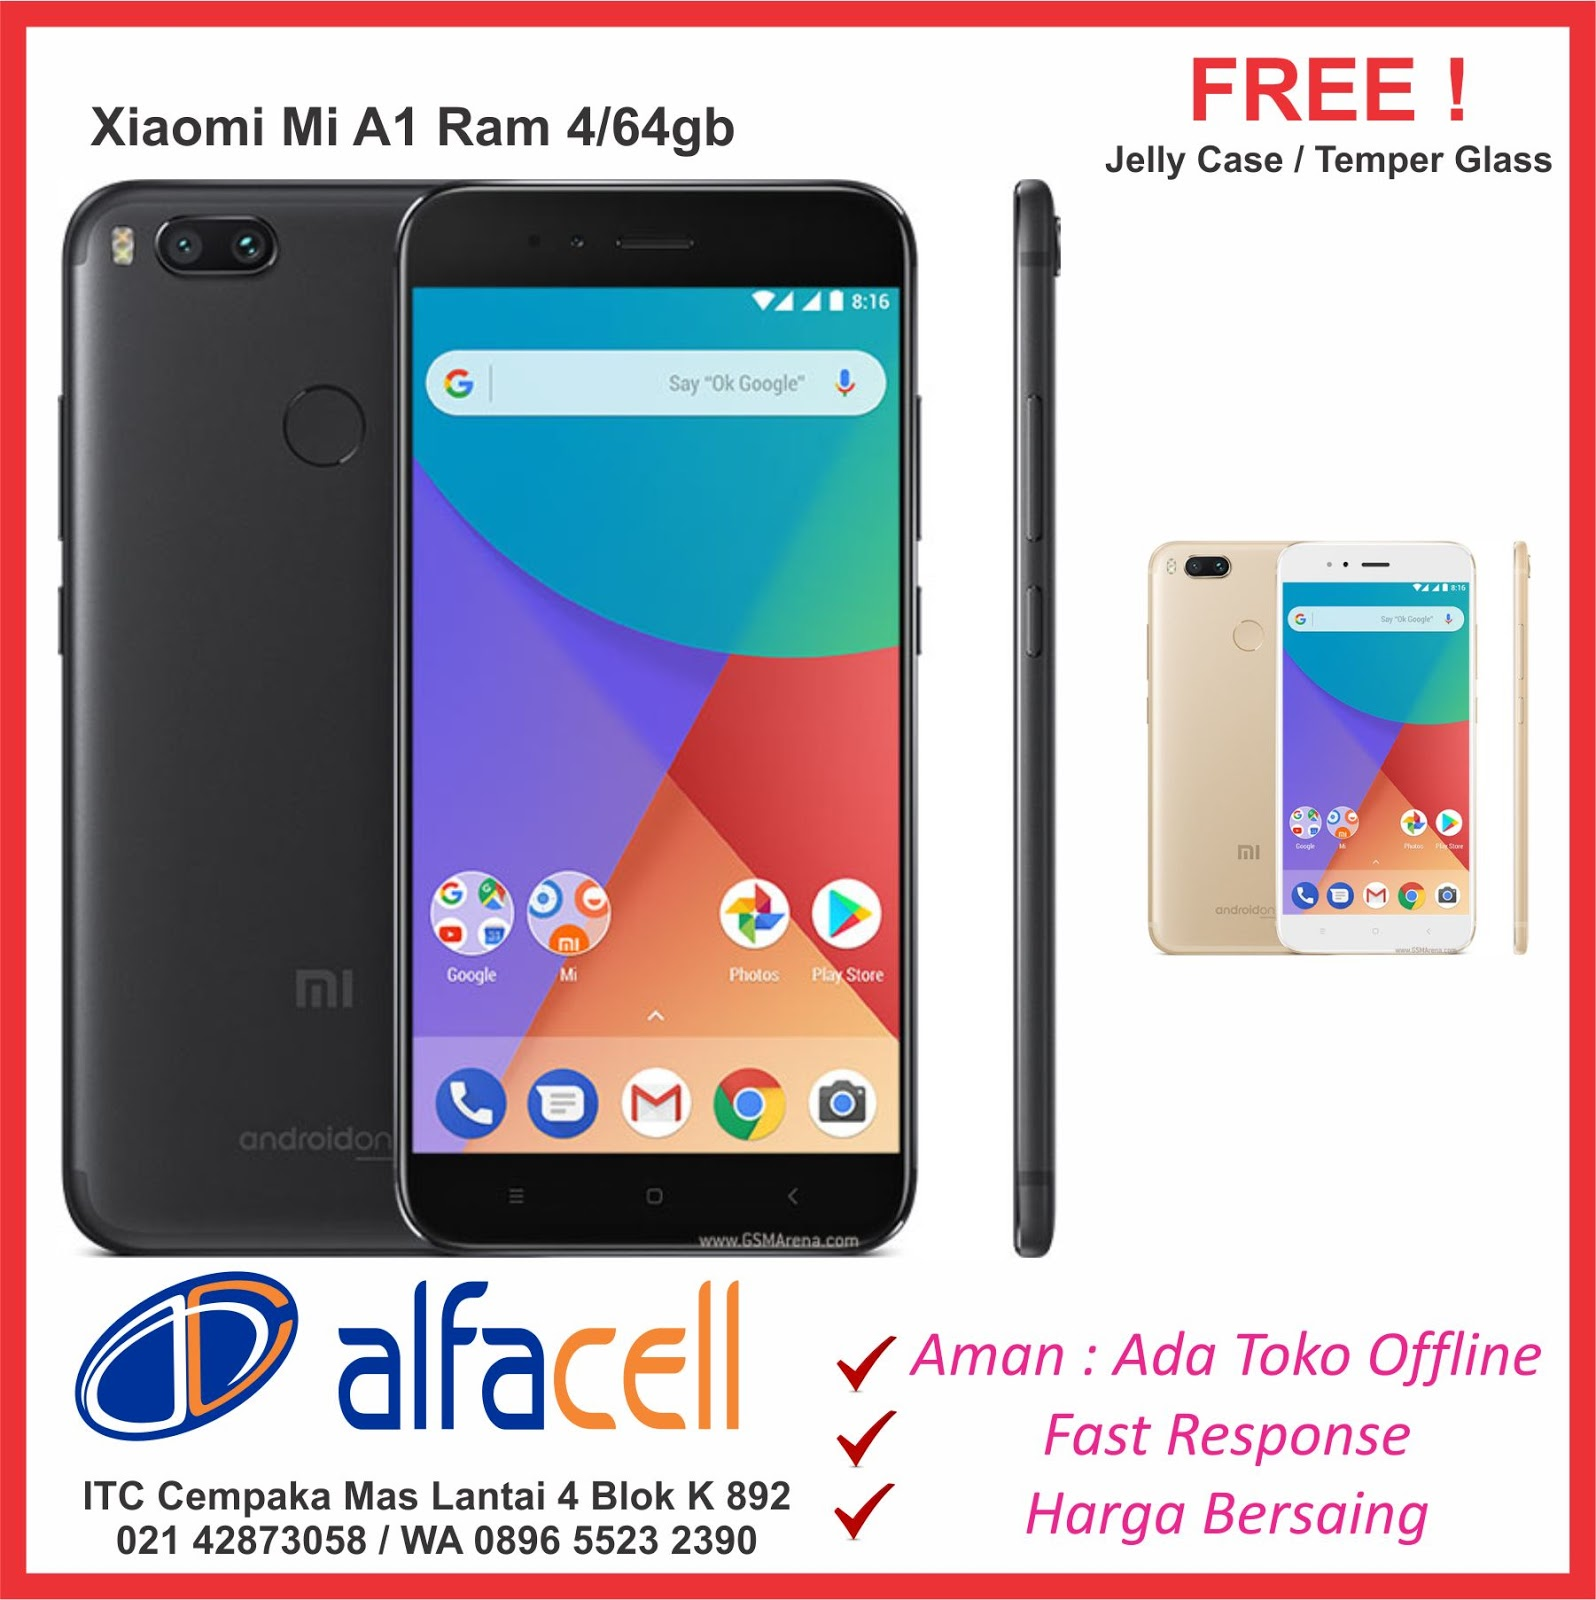 Alfacell Store Service Training Center Xiaomi Murah Itc Cempaka